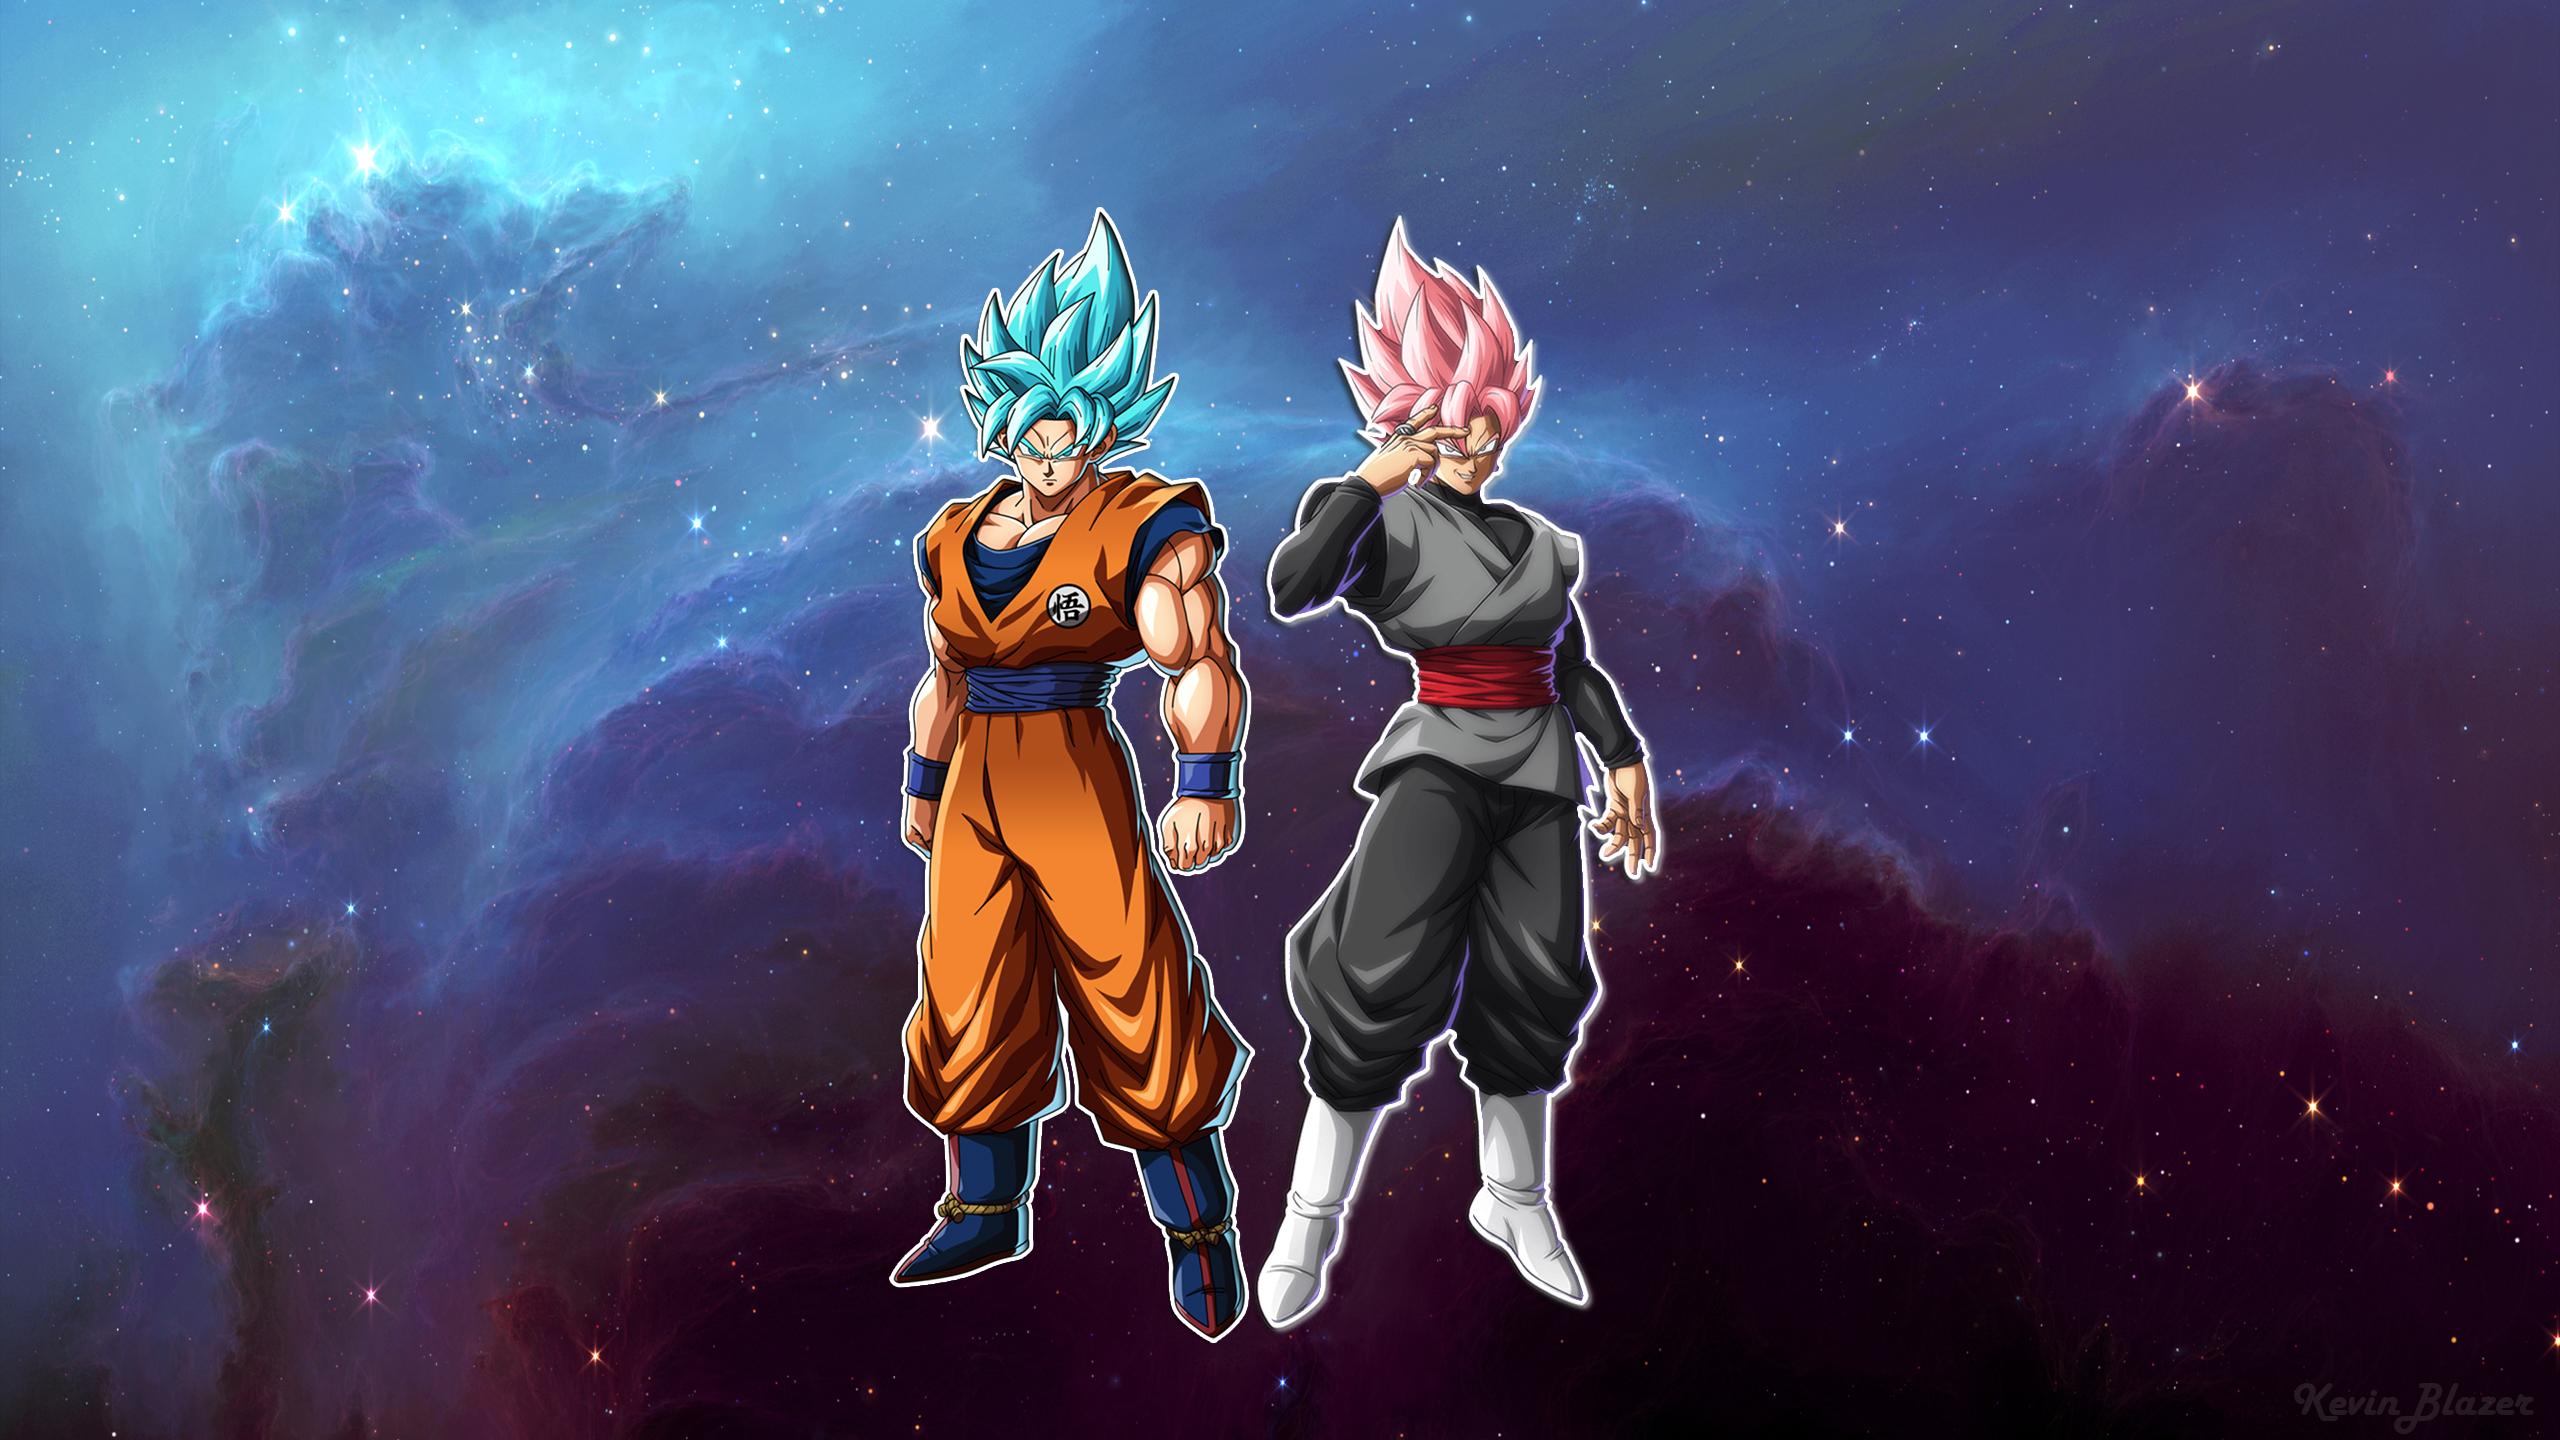 Dragon Ball Z Fighters Wallpaper Goku Vs Black By Kevinblazertm On Deviantart